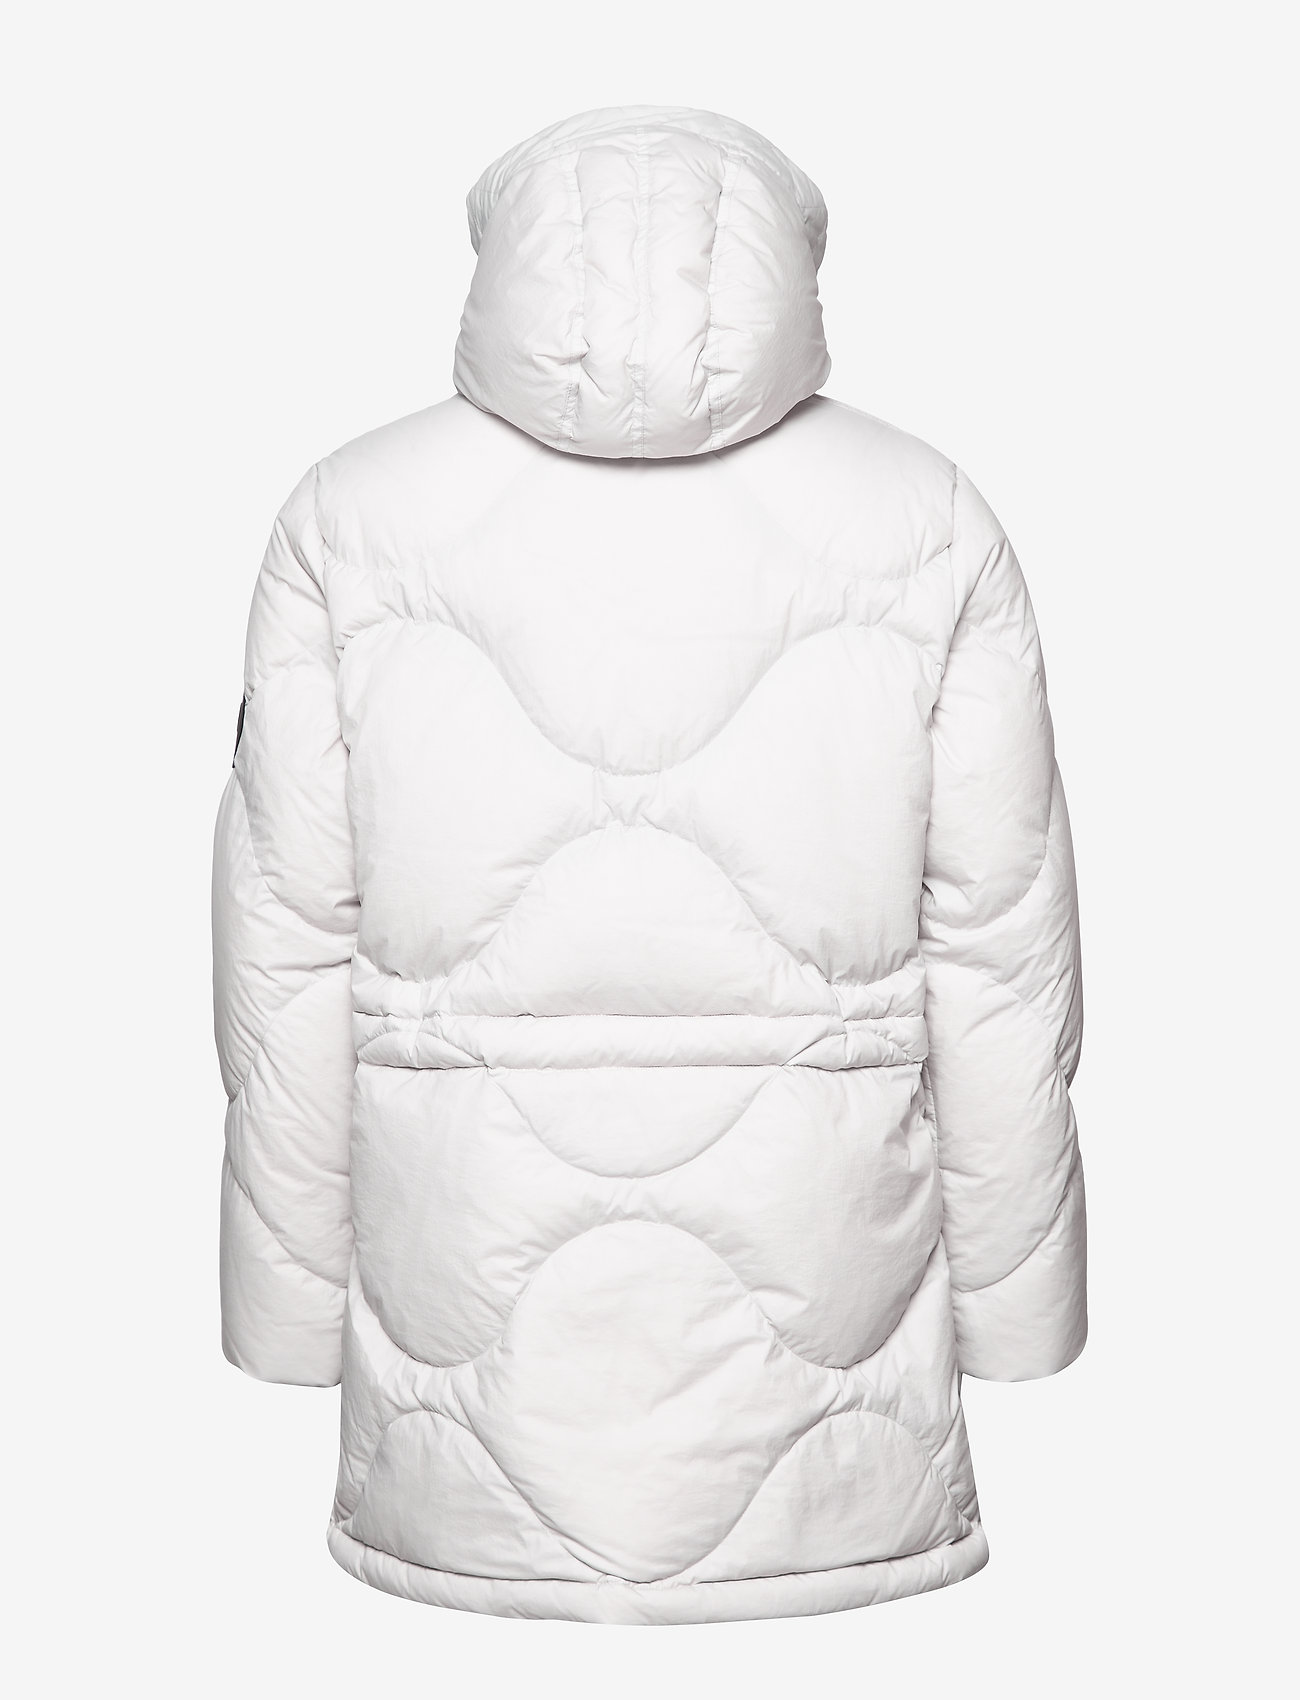 X.10 Arctp (Antarctica) (450 €) - Peak Performance 0Zruk